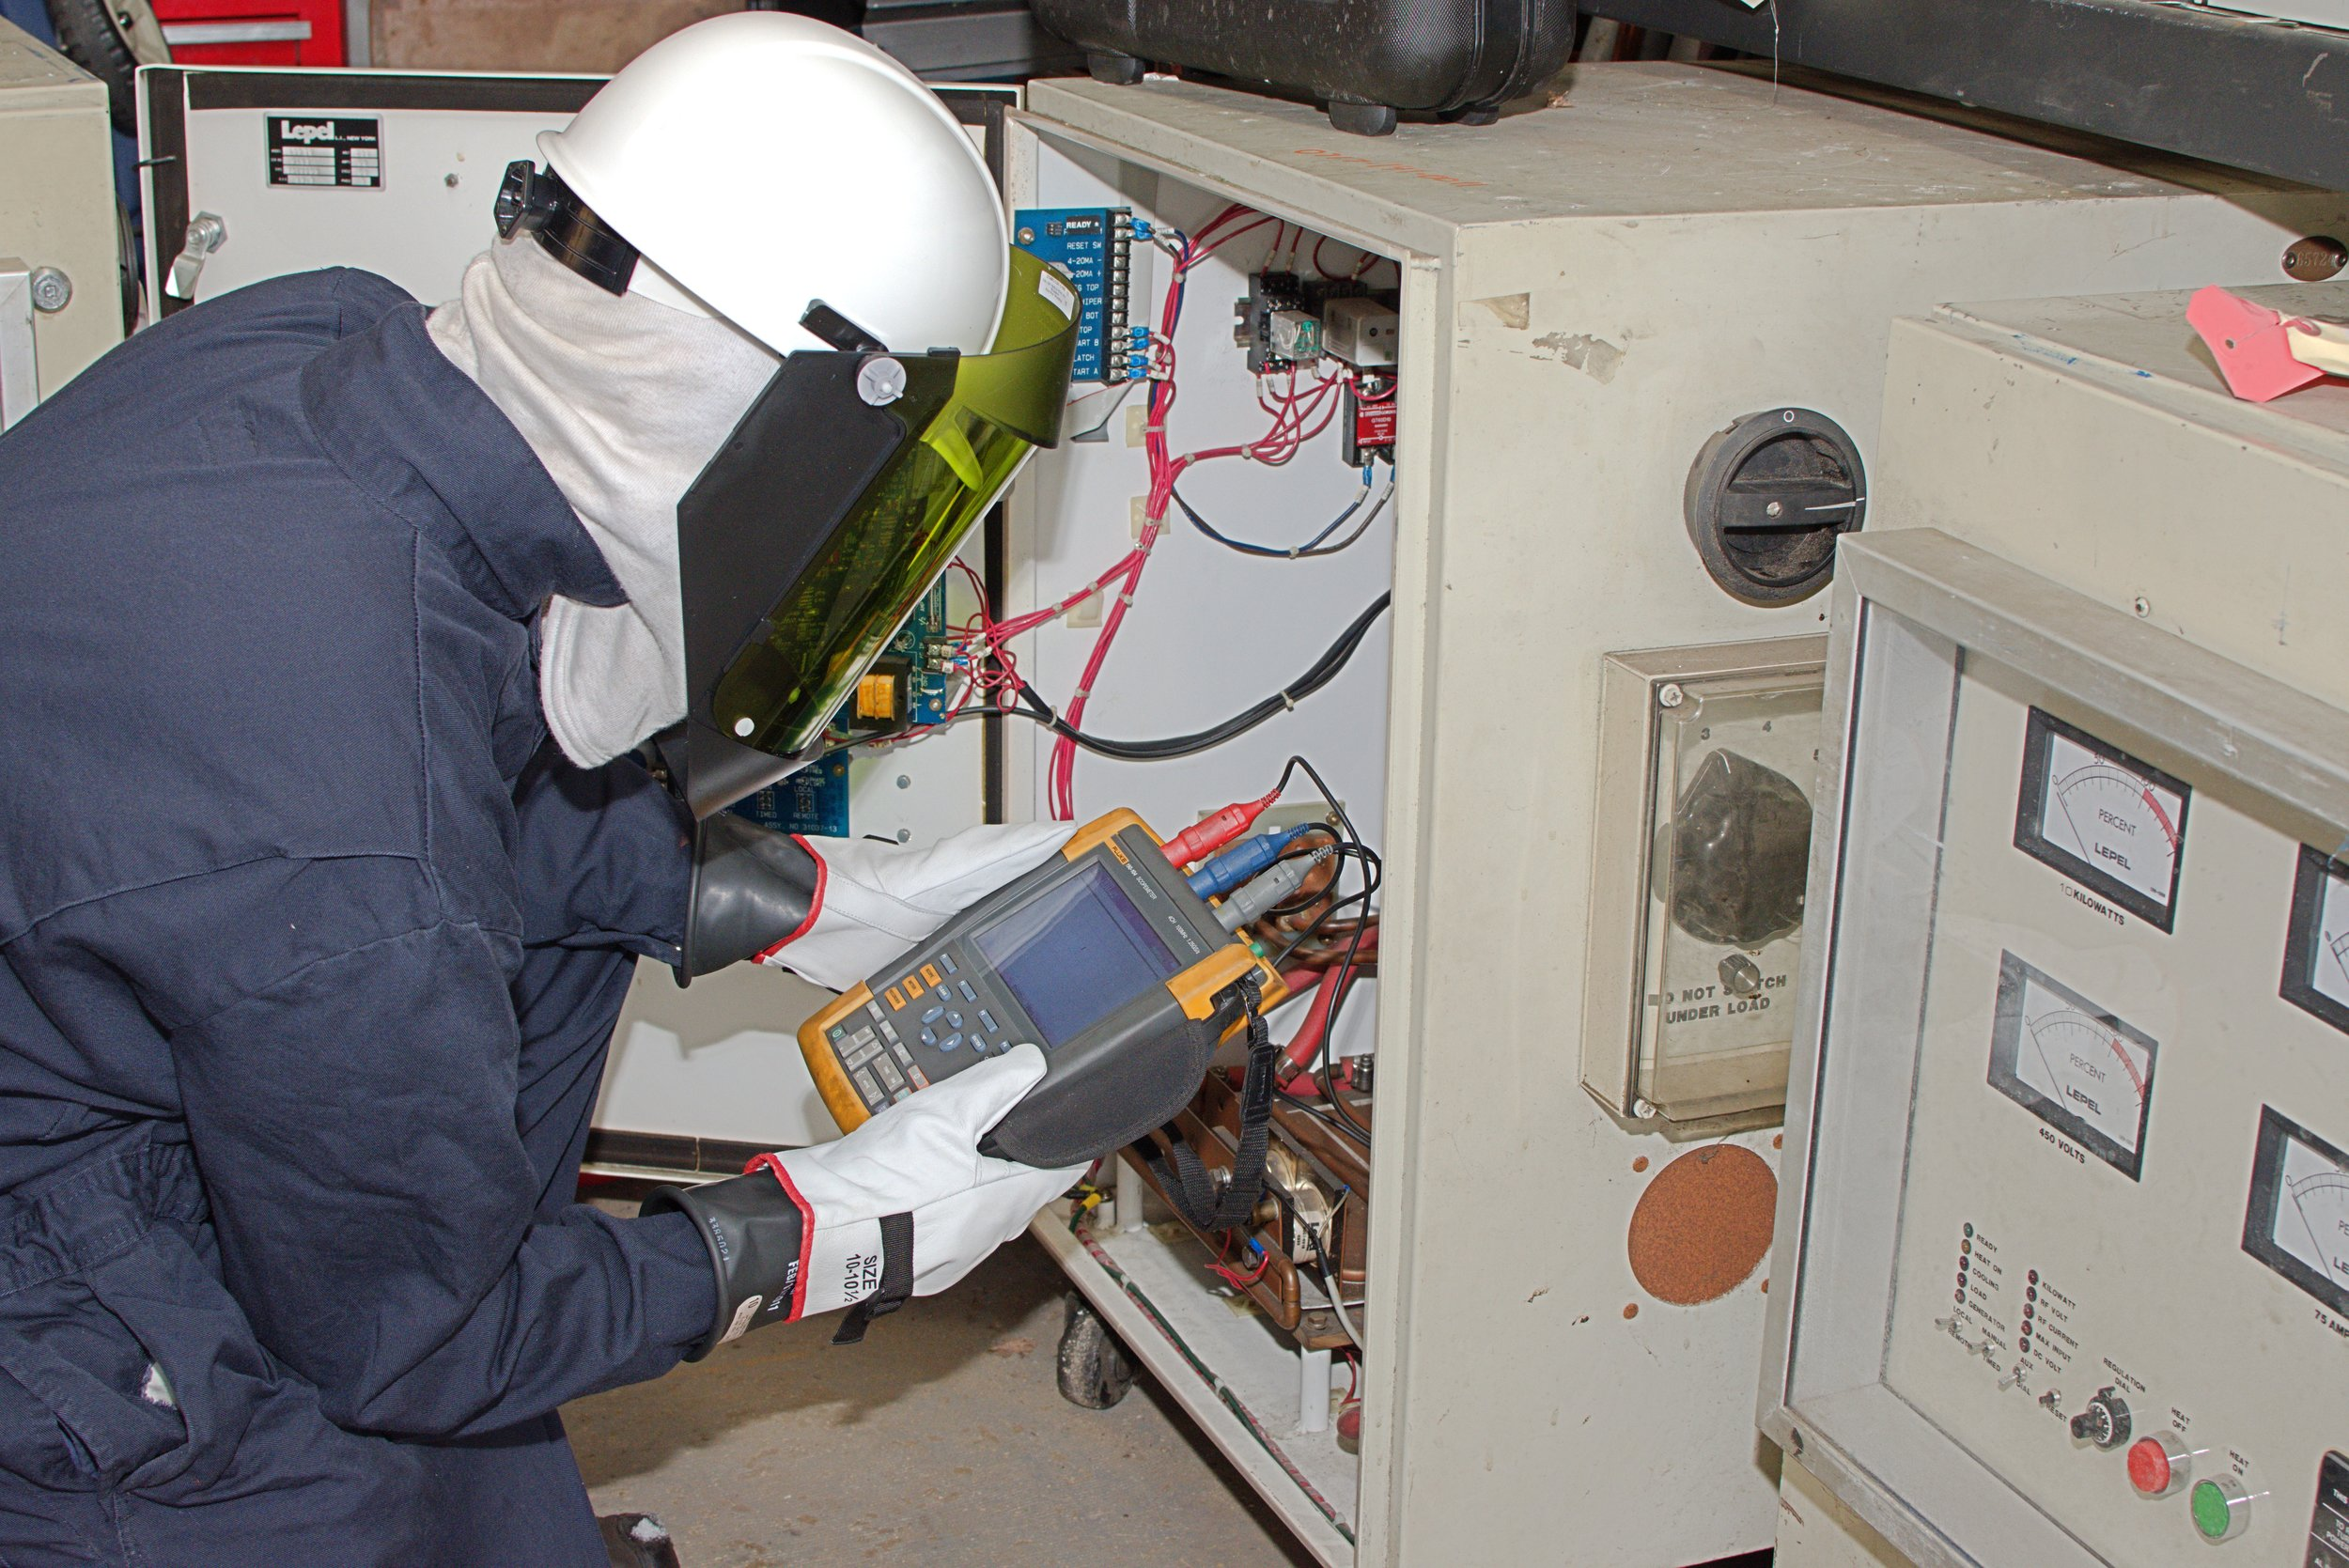 induction heater unit troubleshooting